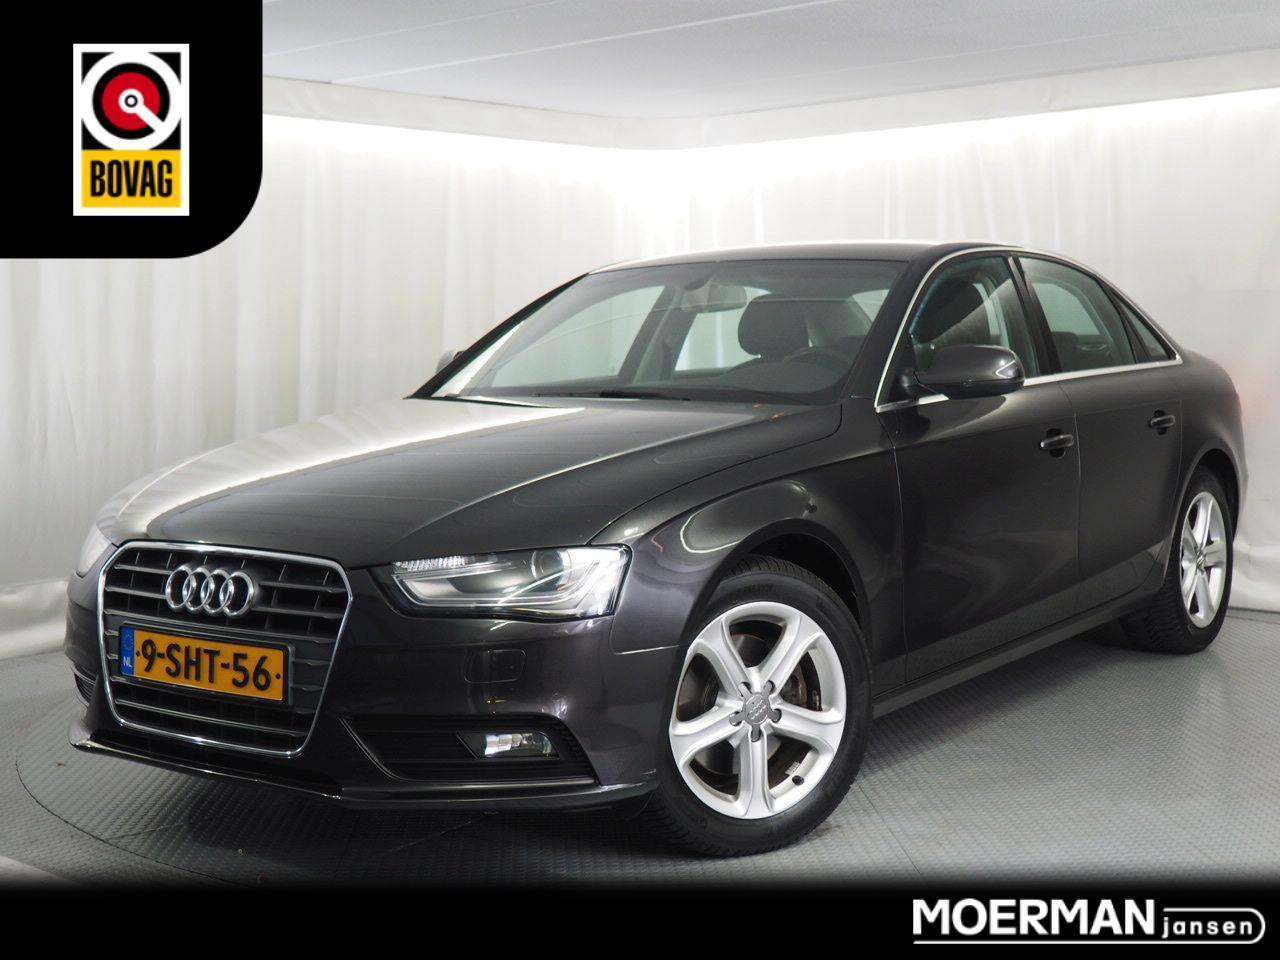 Audi A4 1.8 tfsi business edition automaat / 1e eigenaar / historie bekend / navigatie / 79.000km